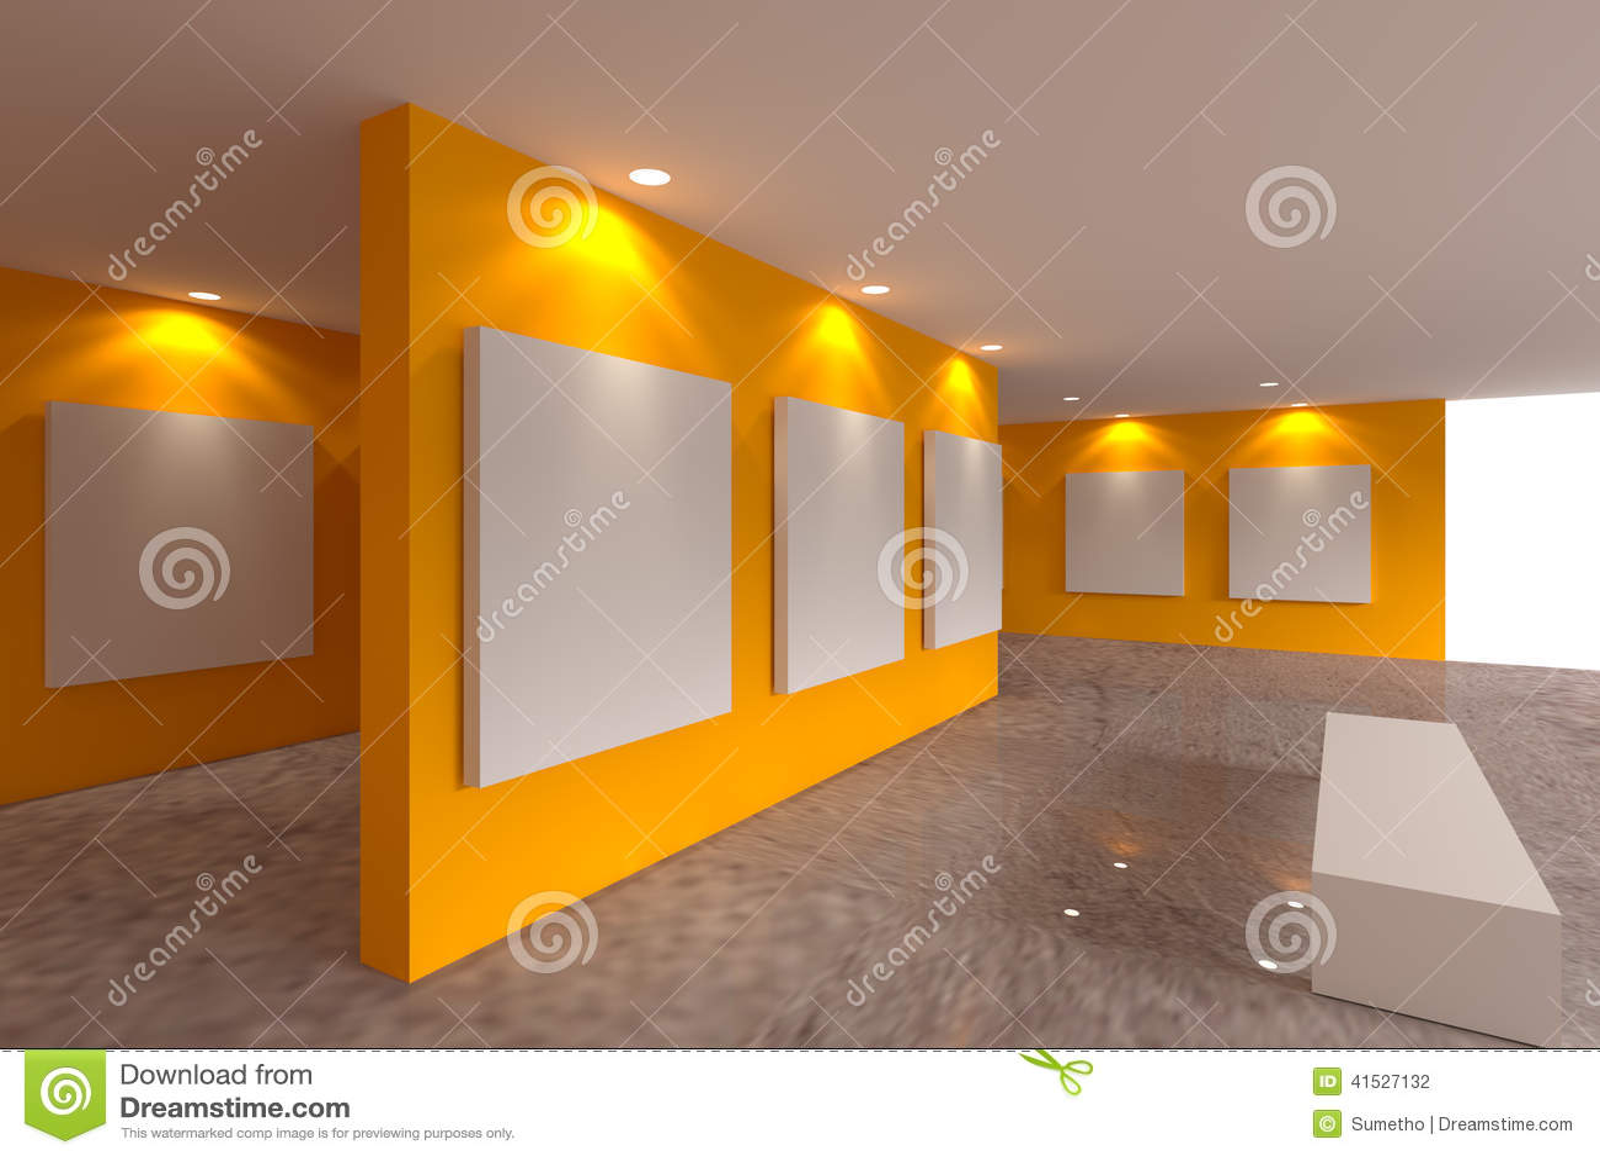 toile sur le mur orange dans la galerie illustration stock image 41527132. Black Bedroom Furniture Sets. Home Design Ideas